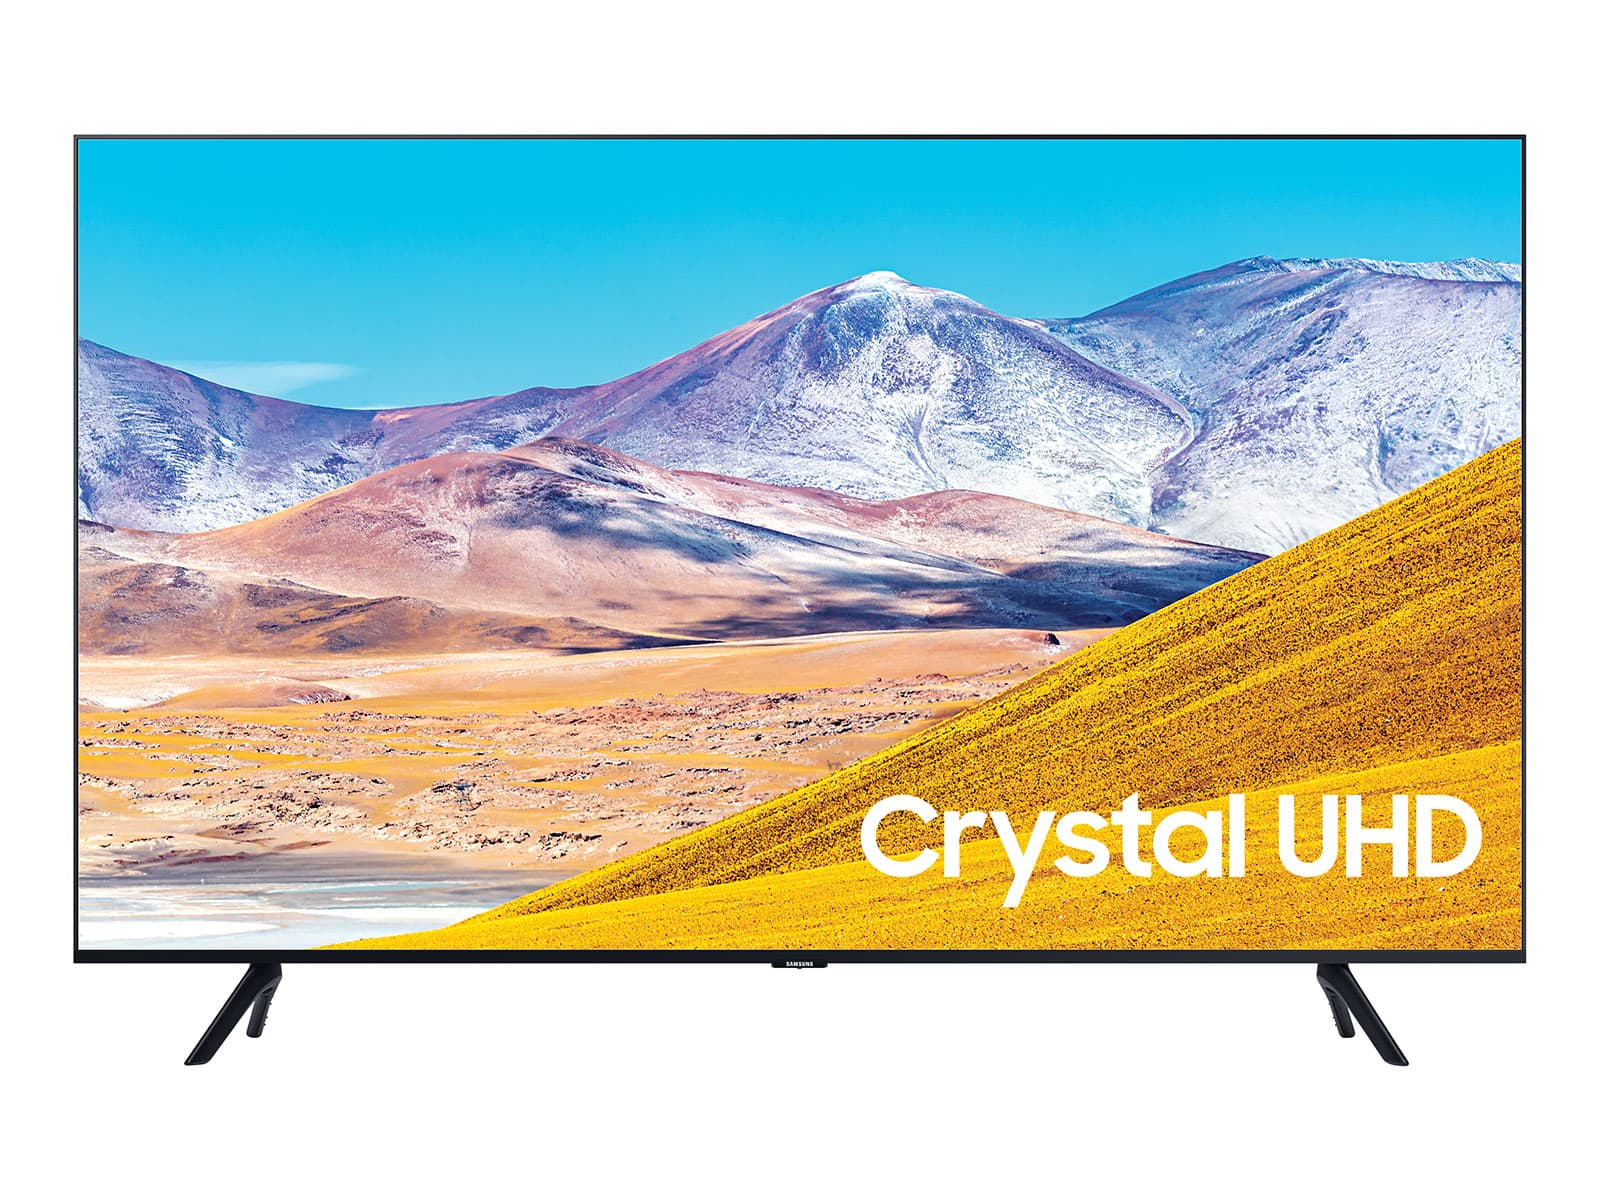 85 inch Samsung TU8000 $1529.99 (EPP) plus $150 Google Play Credit